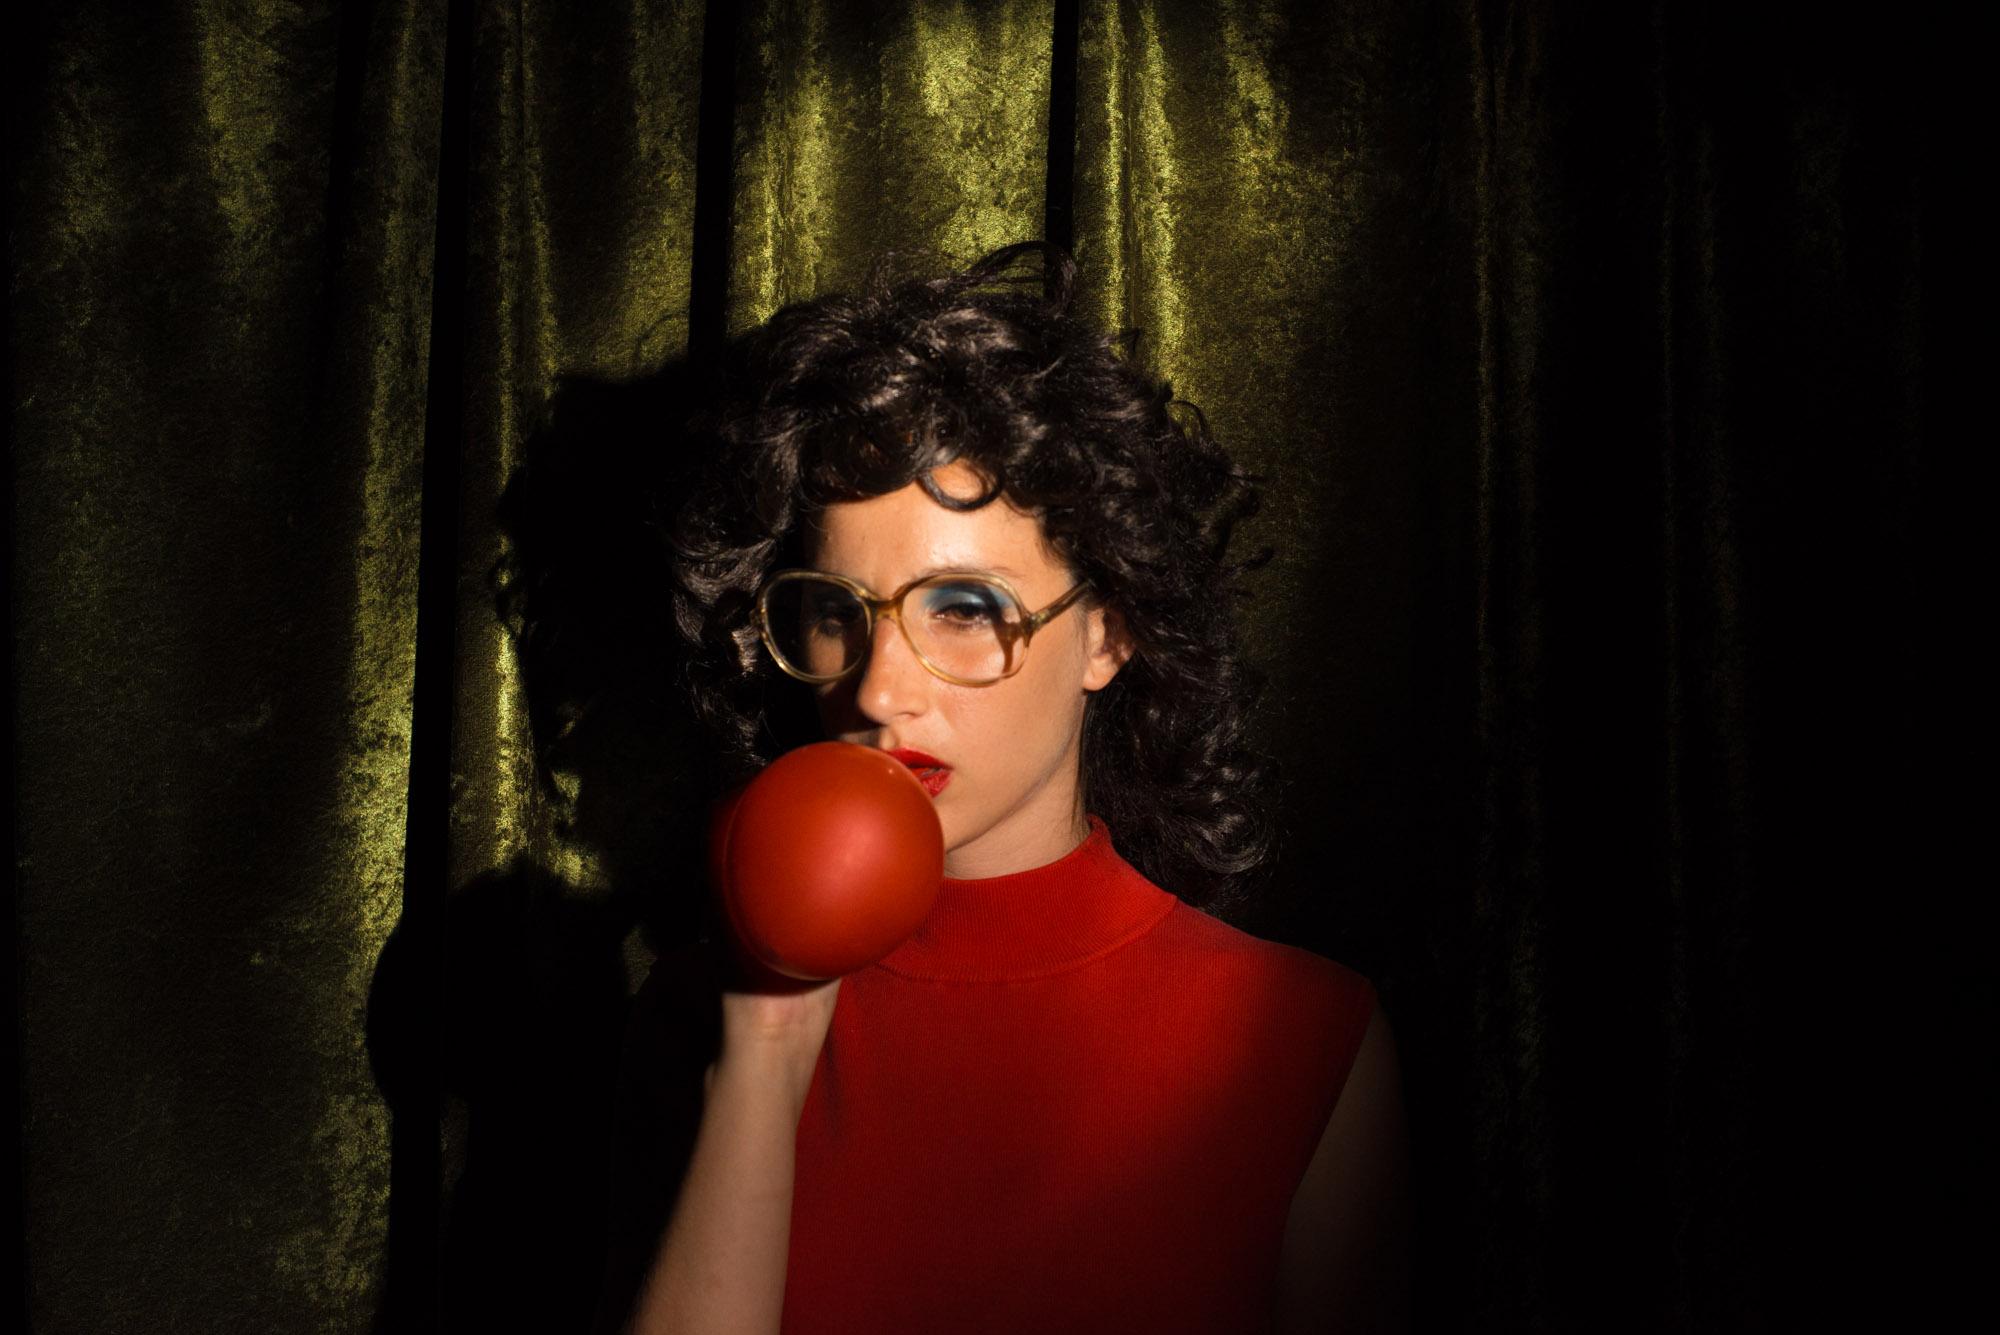 Tania Franco Klein OUR LIFE IN THE SHADOWS C41 Magazine Issue 9 Eros 14